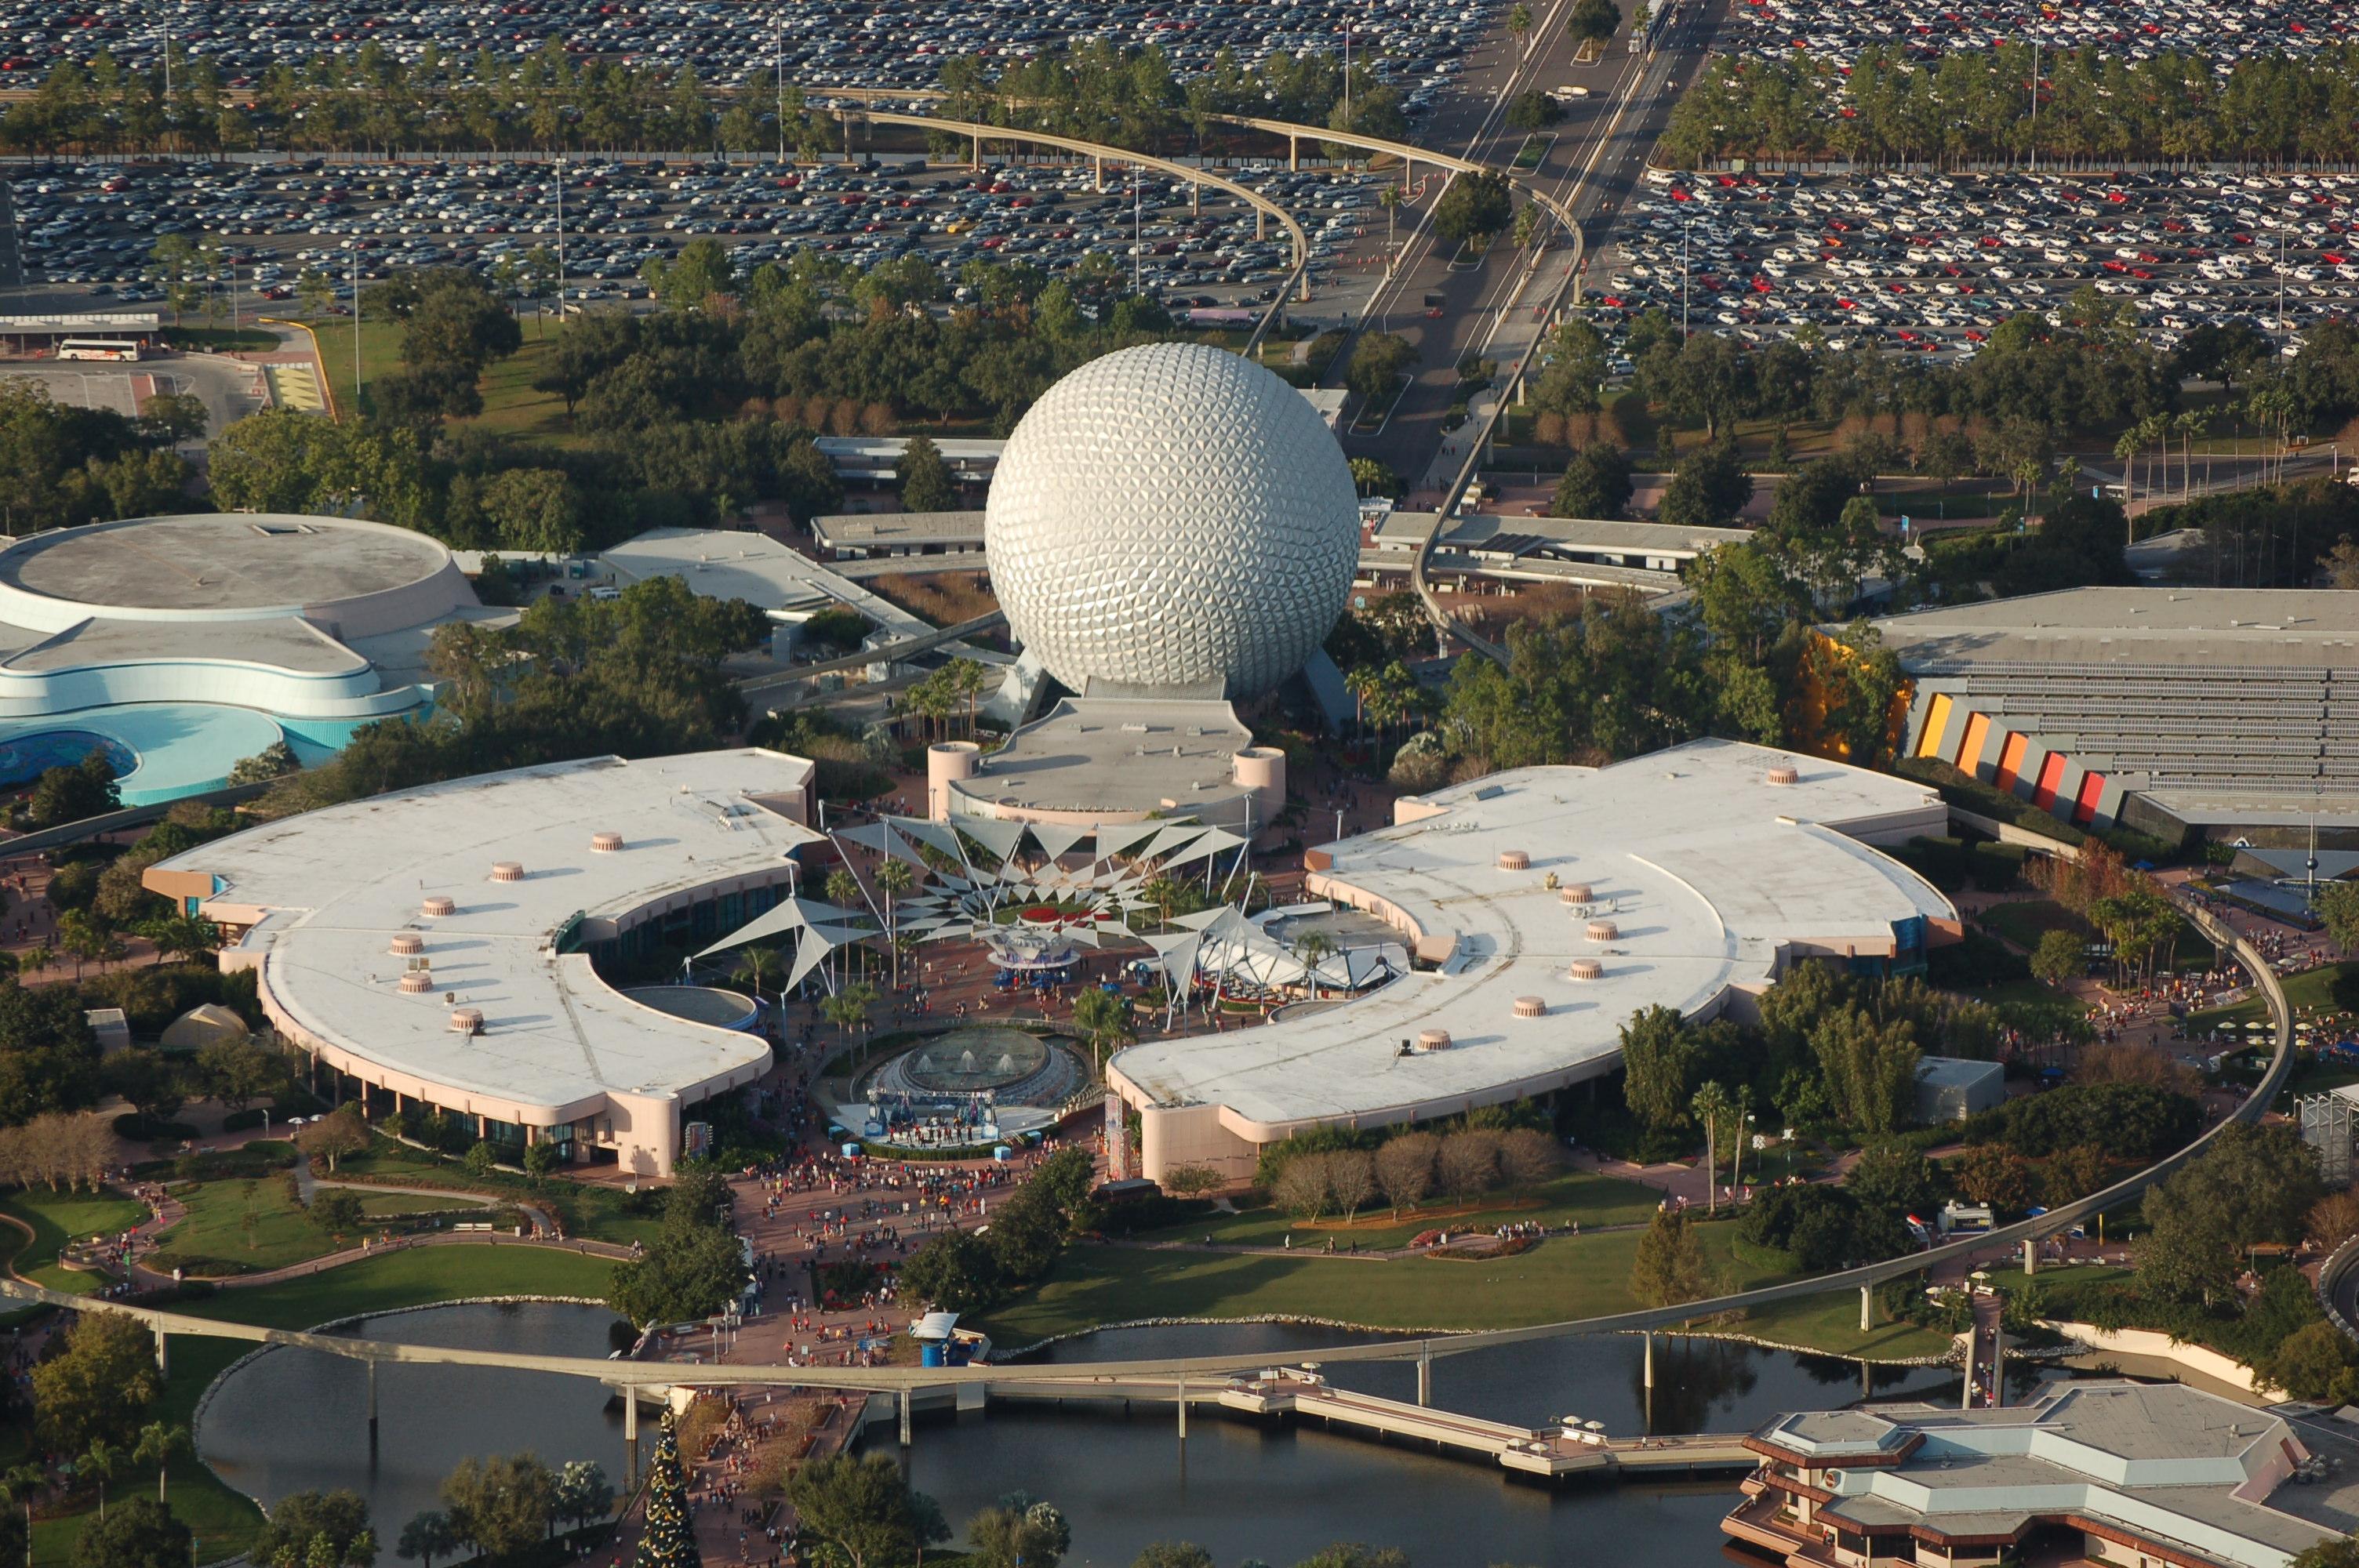 Theme Park Review Walt Disney World Aerial Photos